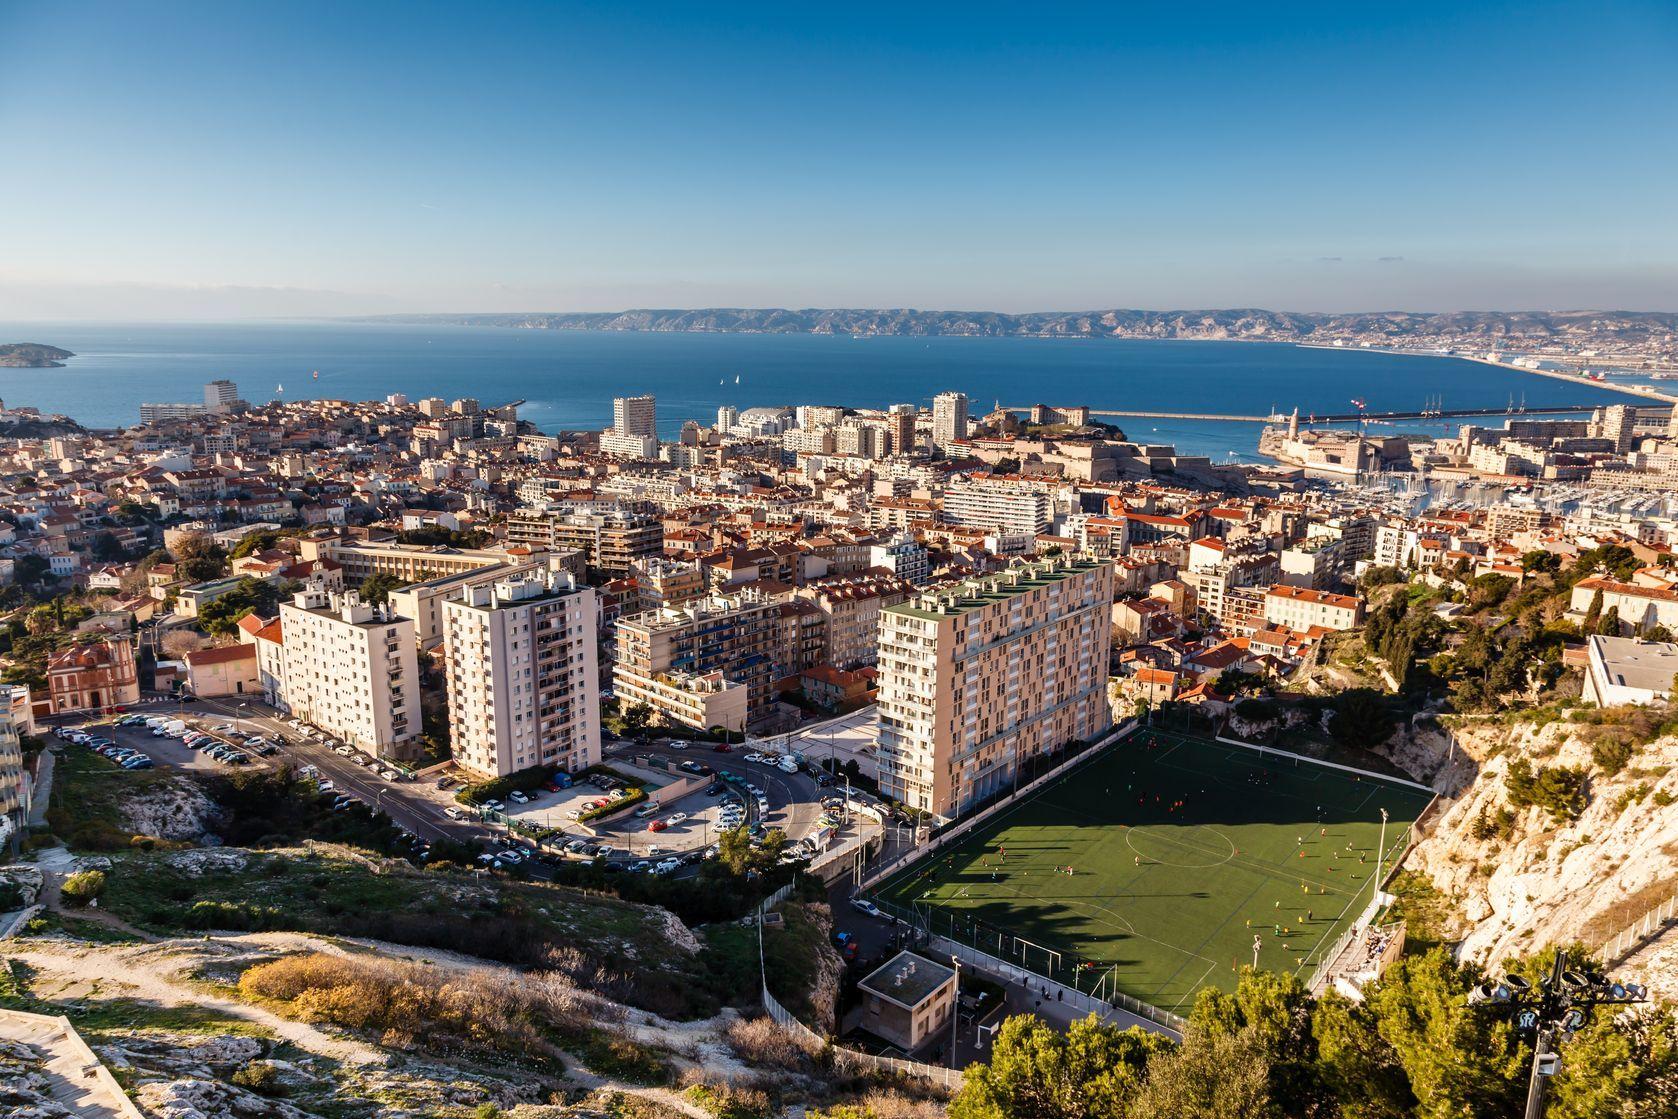 Letecký pohled na Marseille | anshar/123RF.com